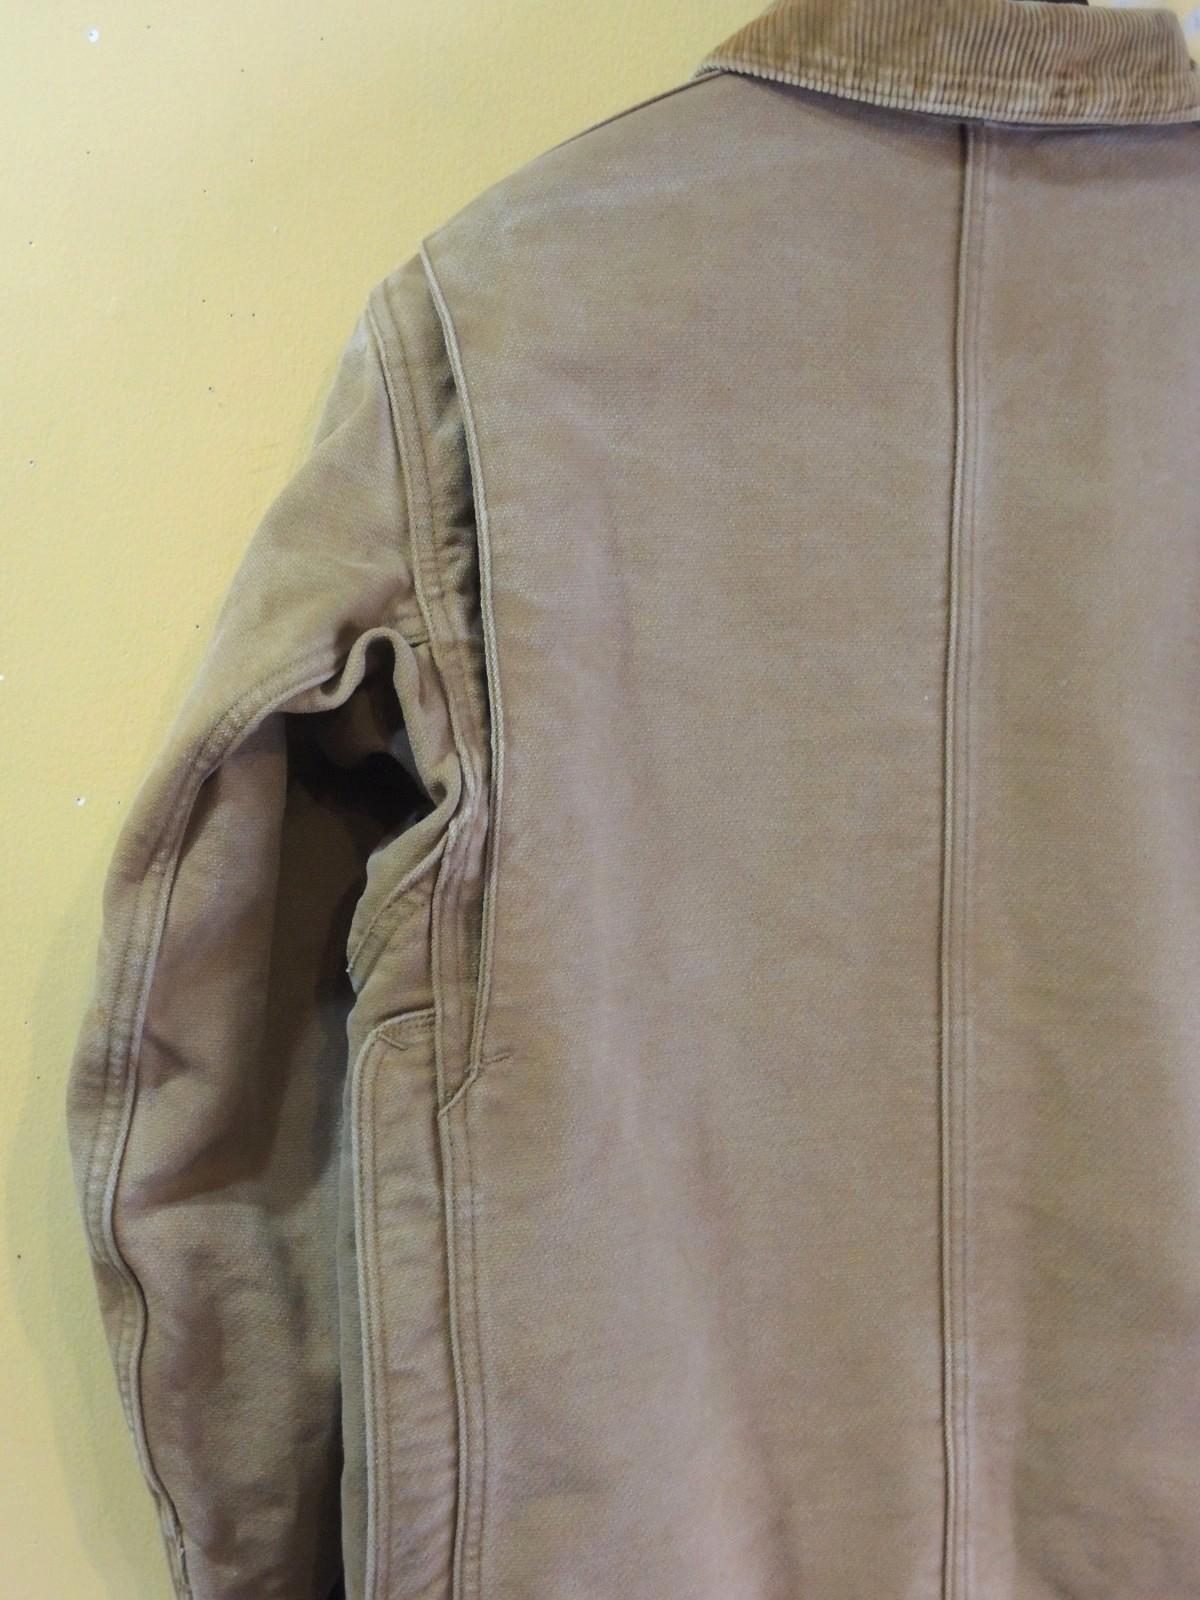 westernfieldmontgomerywardhuntinngjacket010.JPG